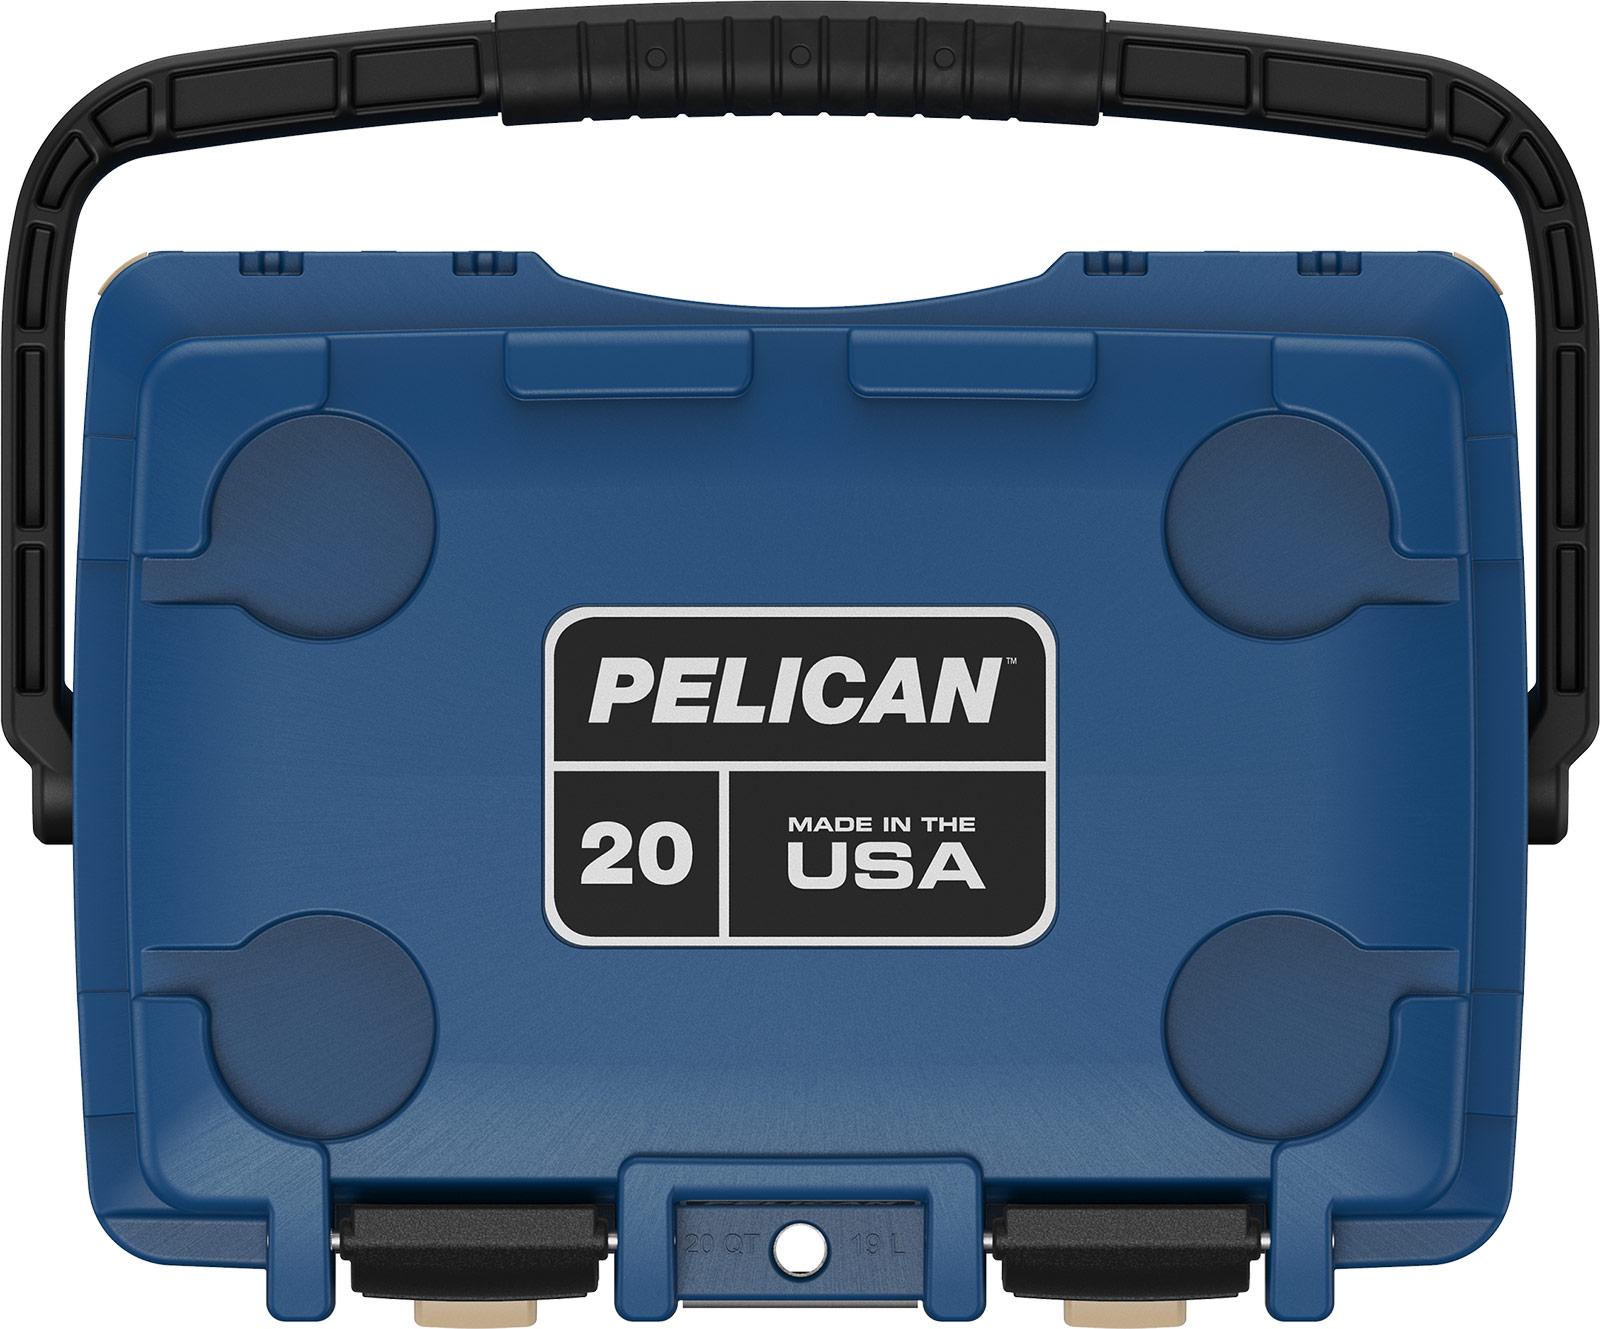 pelican blue overland coolers 20qt cooler